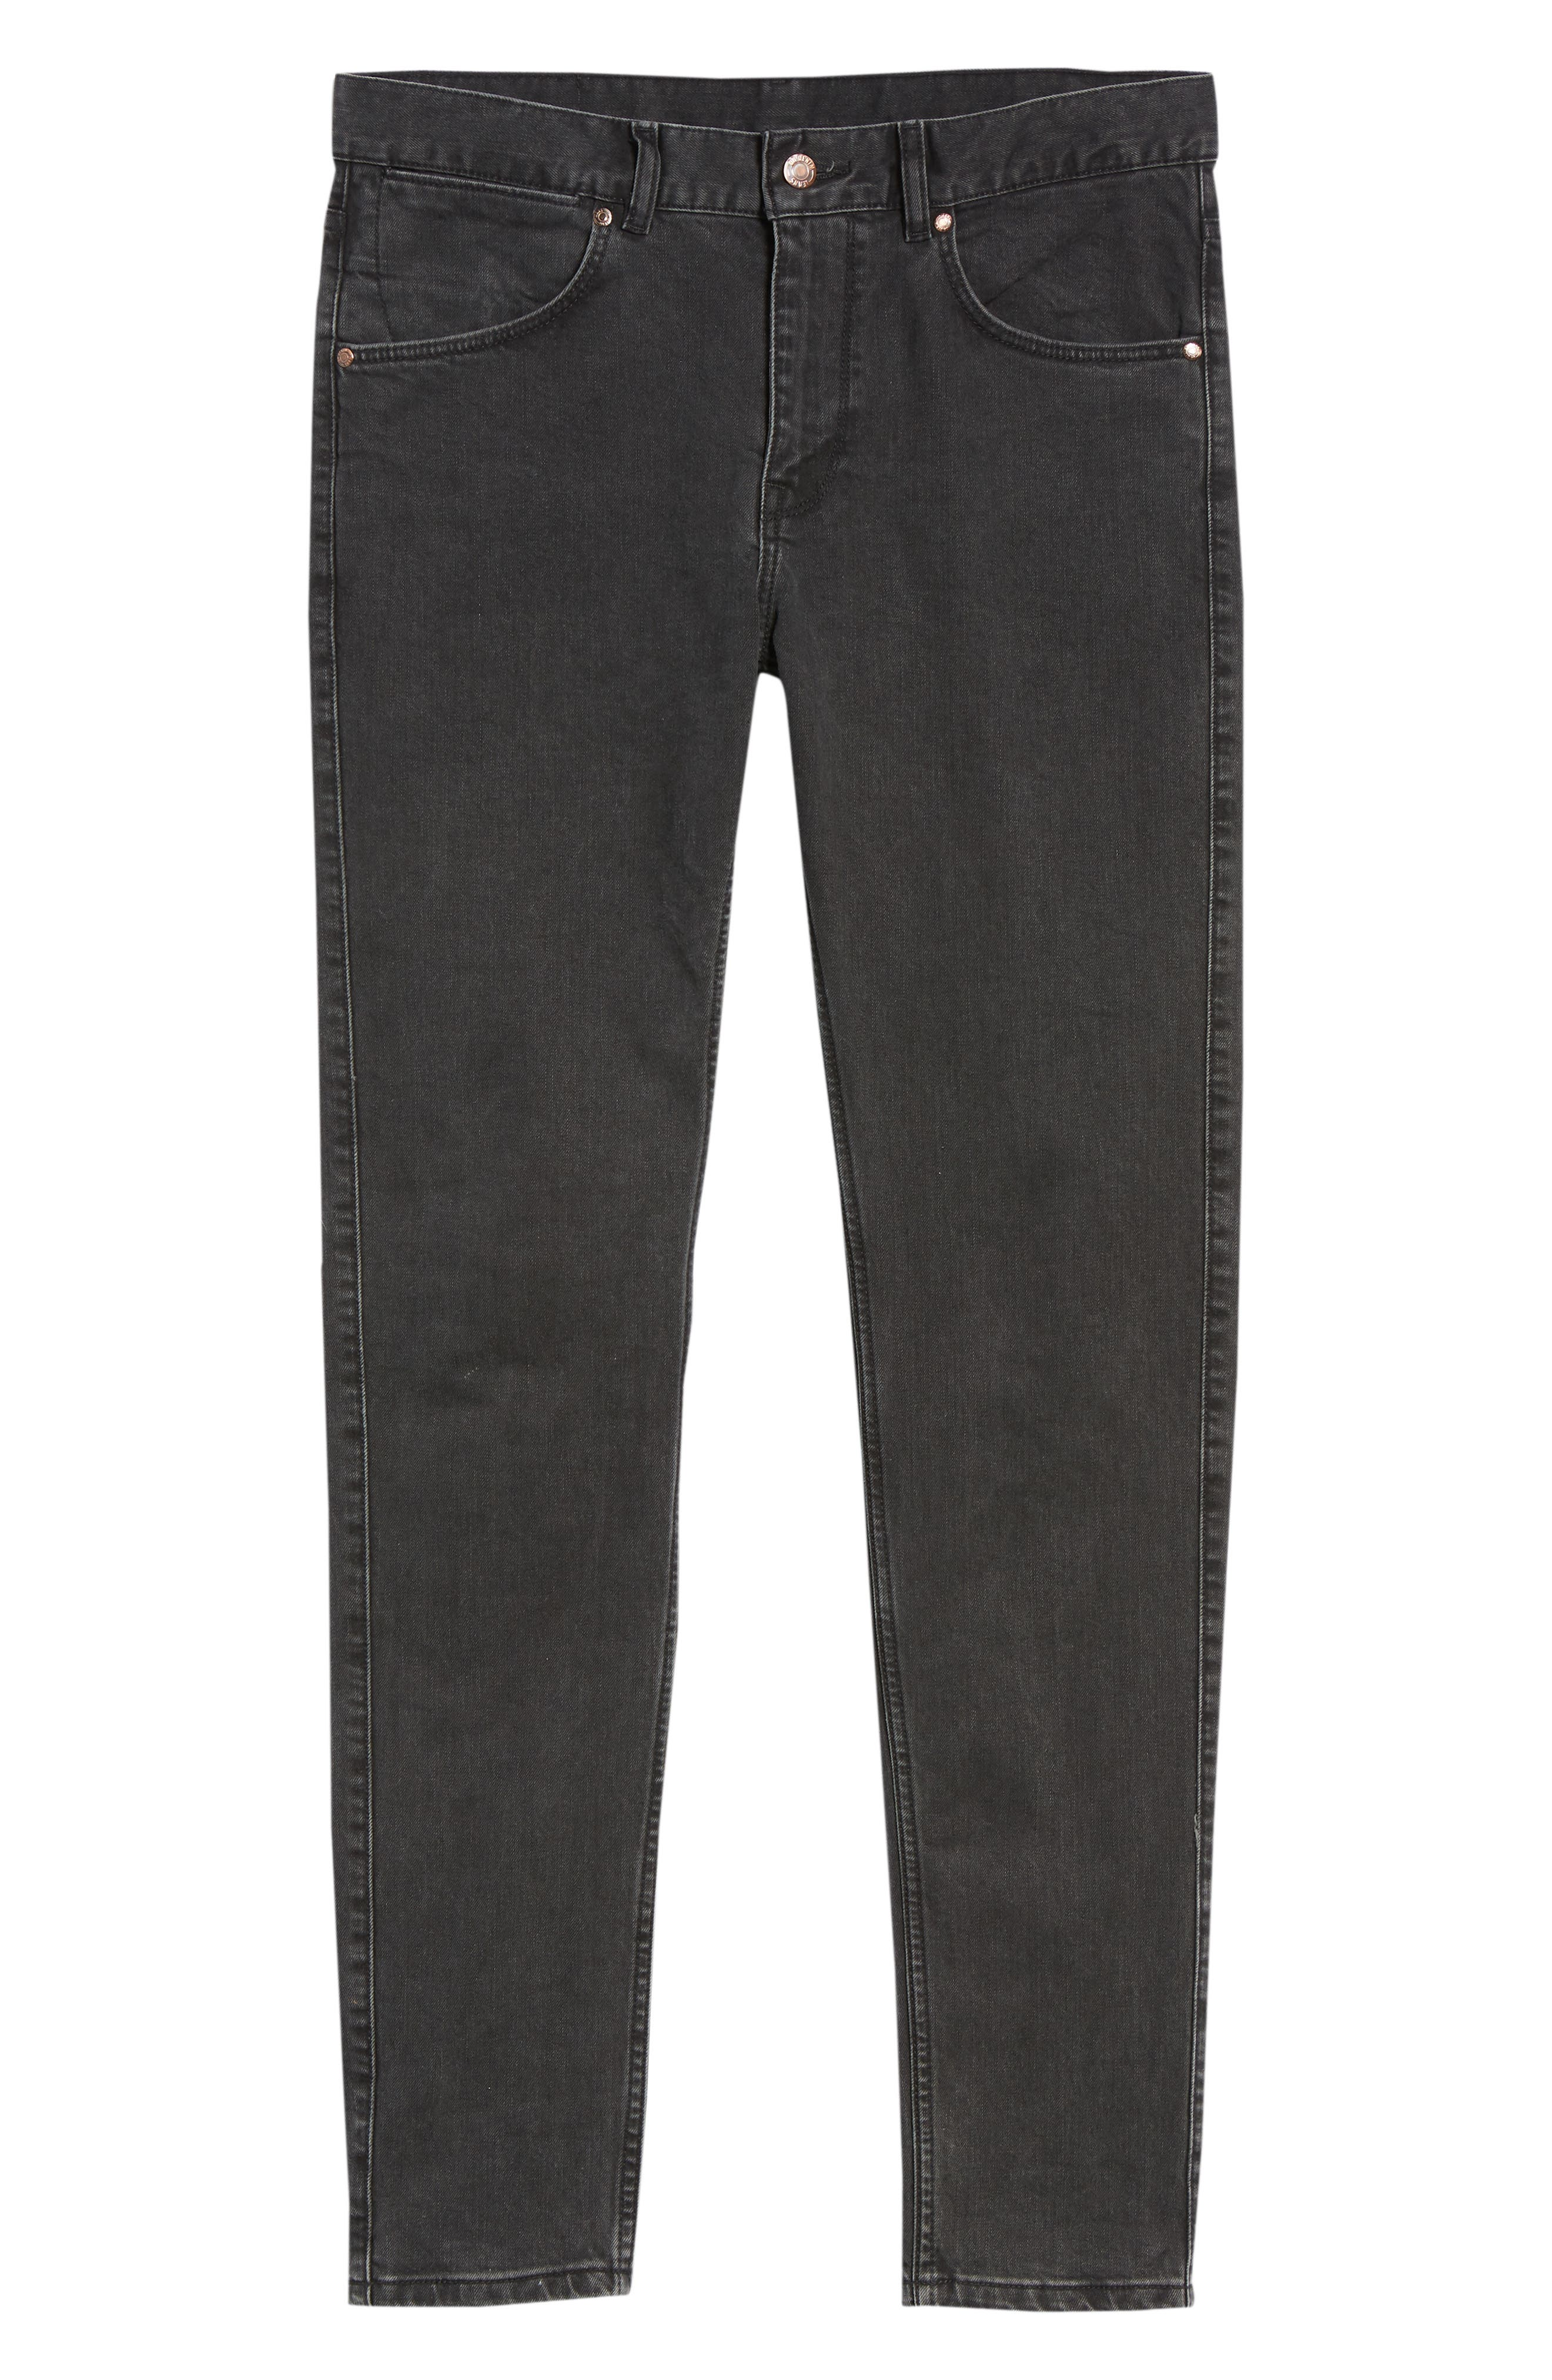 Clark Slim Straight Leg Jeans,                             Alternate thumbnail 7, color,                             Black Vintage